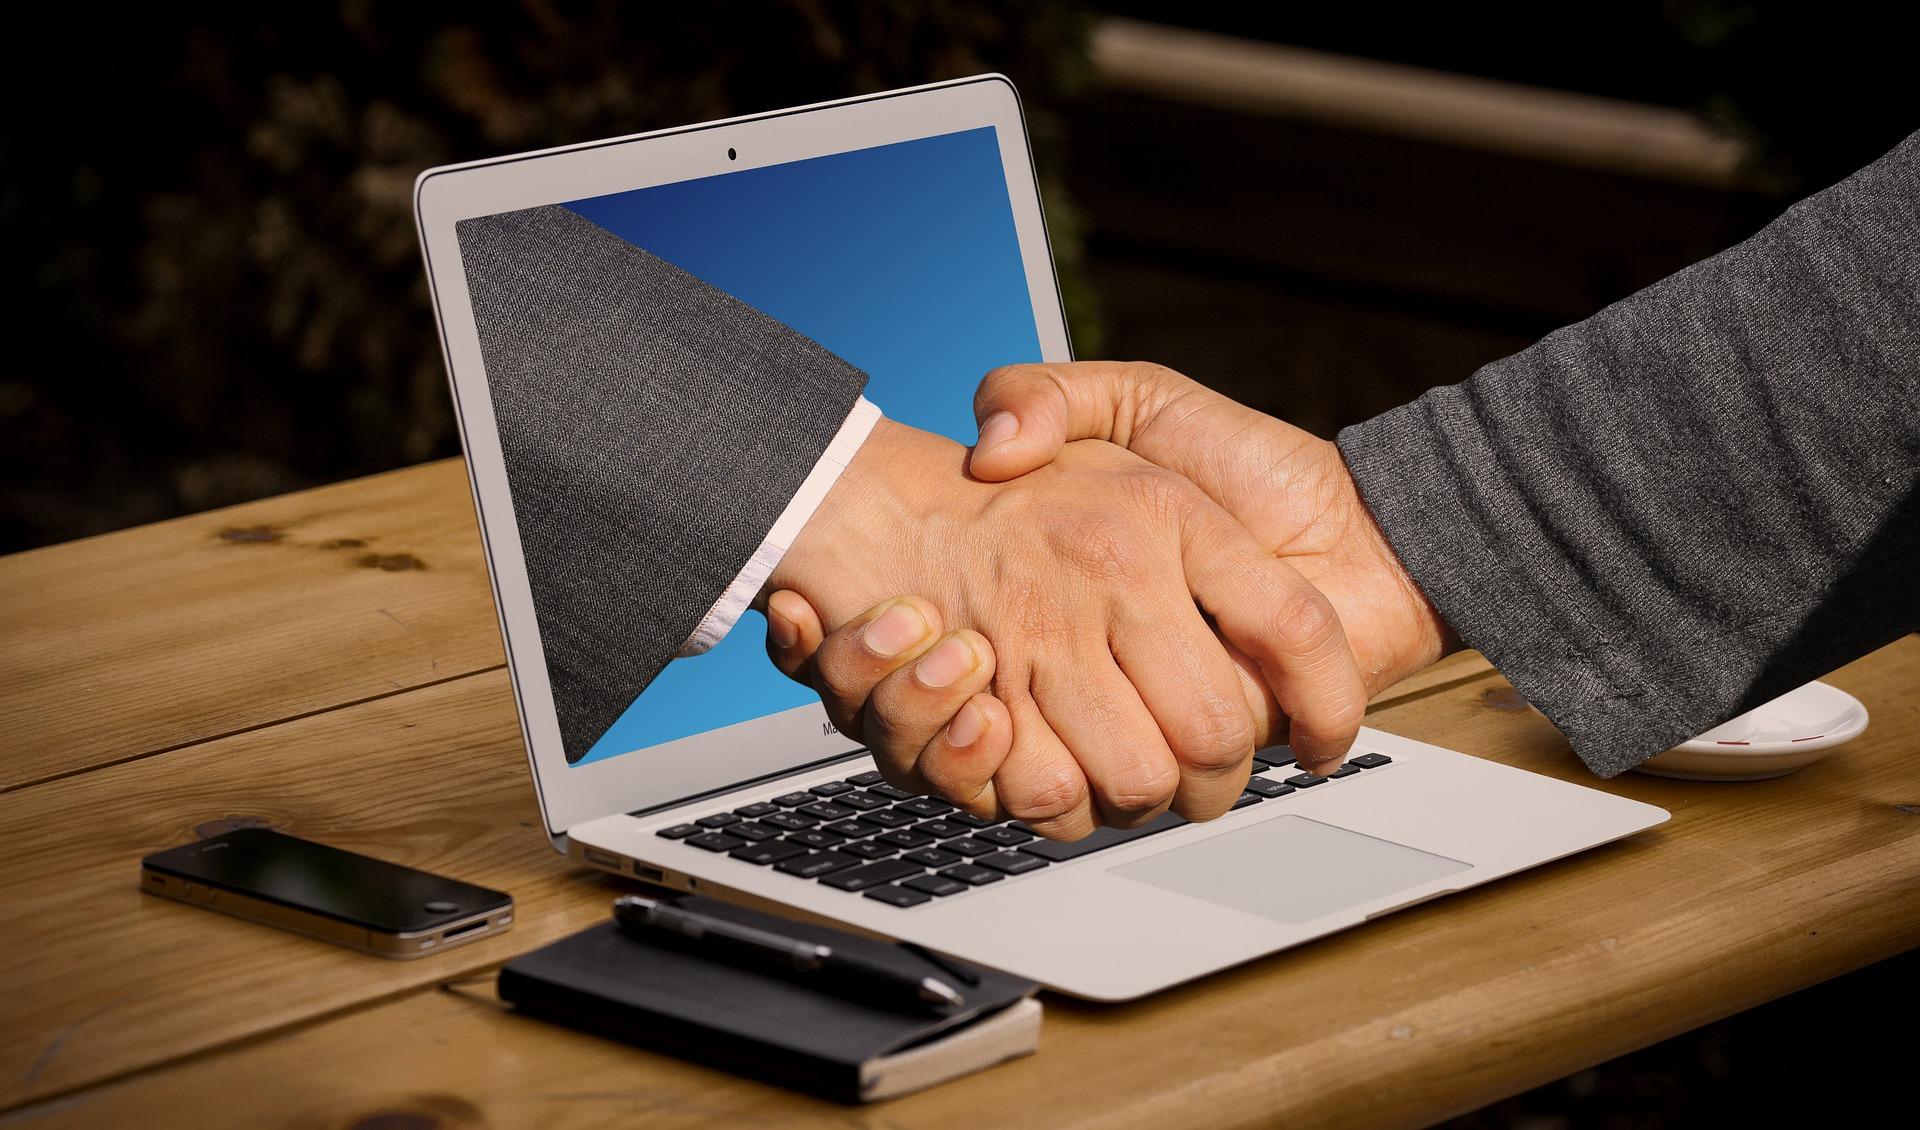 handshake 3382504 1920 - Digital